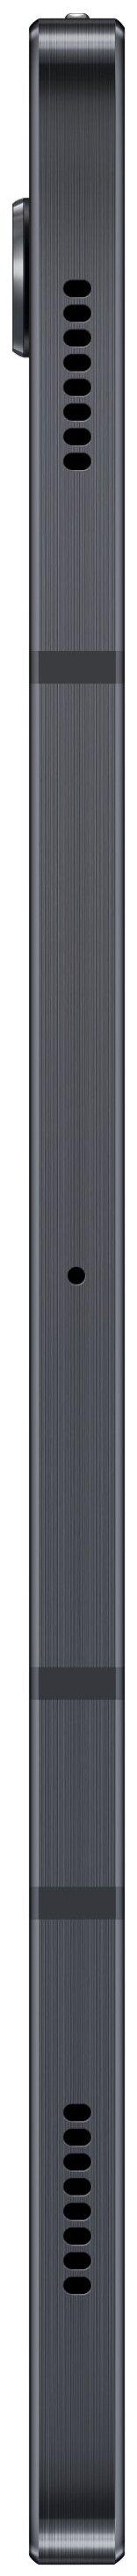 Samsung Galaxy Tab S7 11 SM-T870 128Gb Wi-Fi (2020) - процессор: Qualcomm Snapdragon 865+